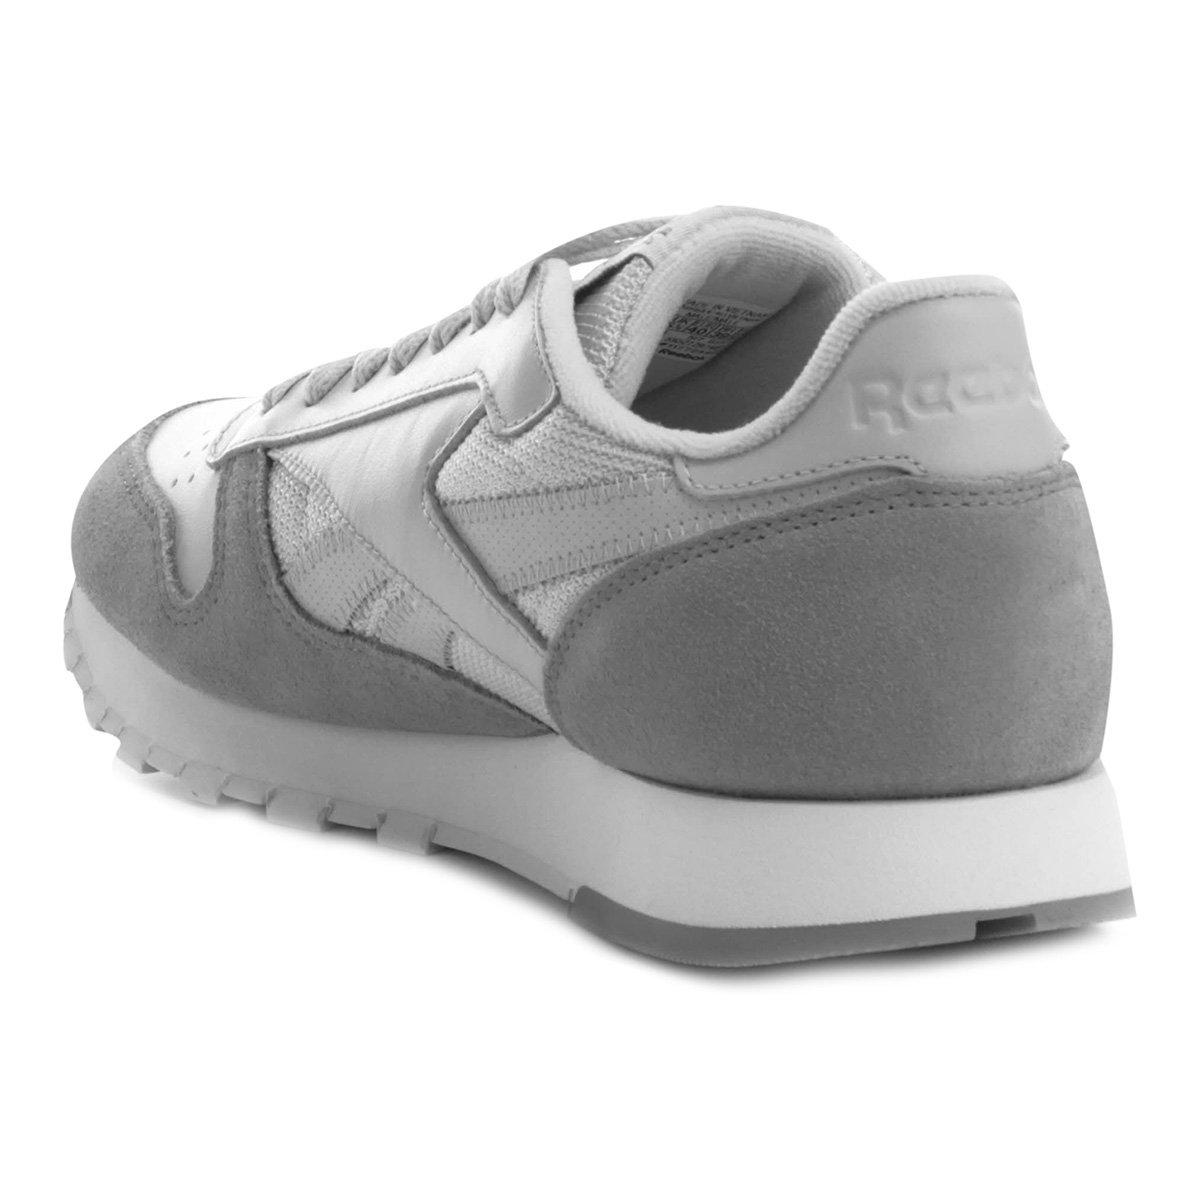 Tênis Reebok Cl Leather Mo Masculino - Compre Agora  ecf1b89f0484d